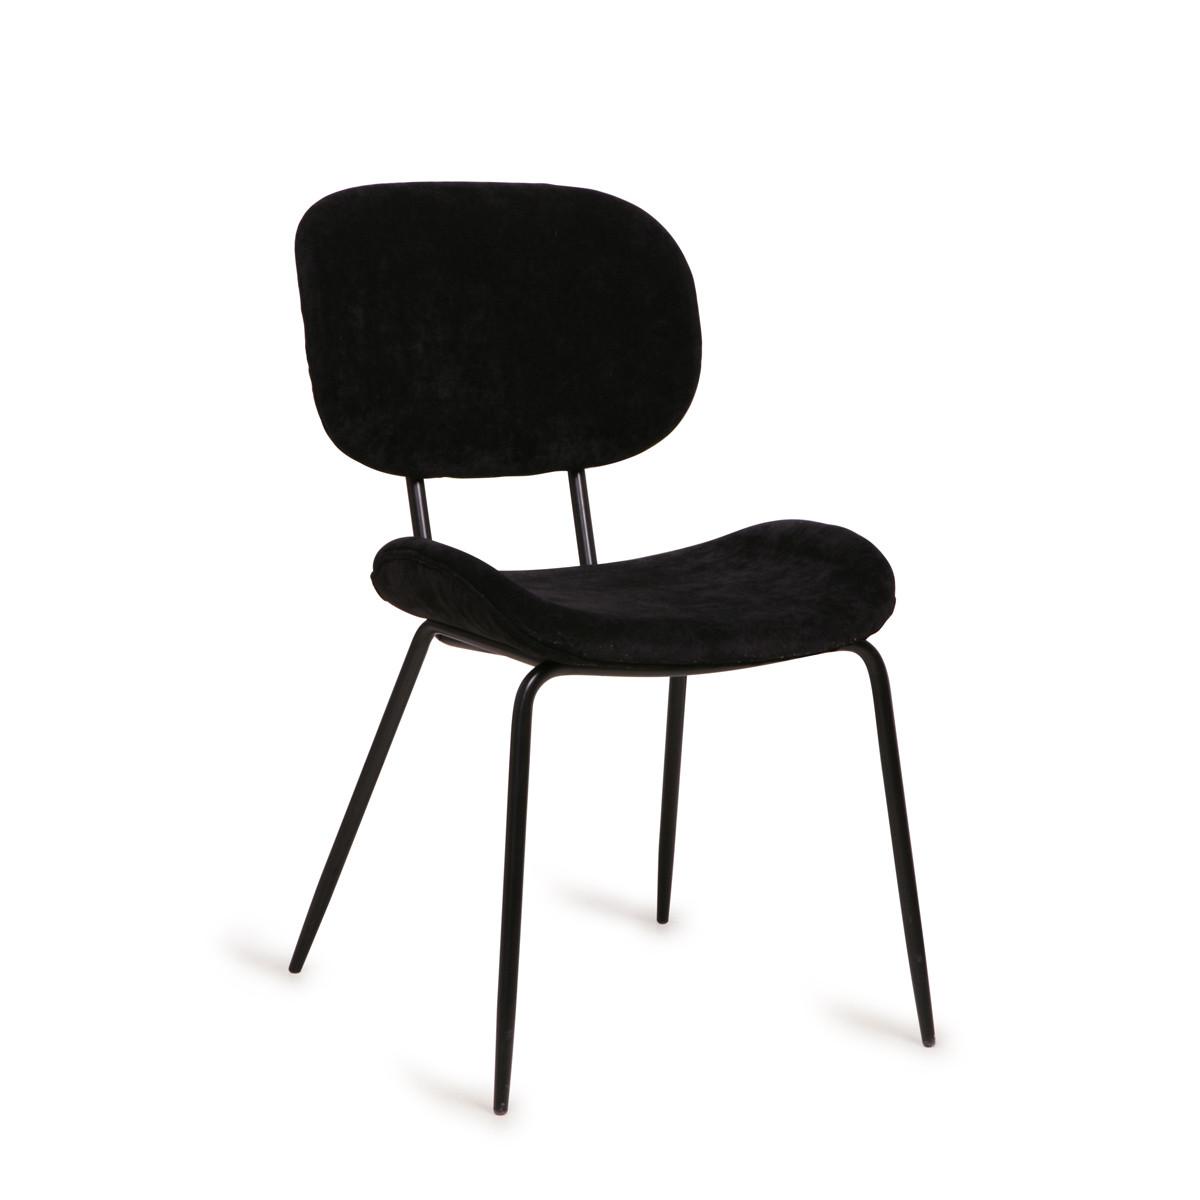 HKliving   Retro design stoel met ribstof   MSK3706   LUMZ